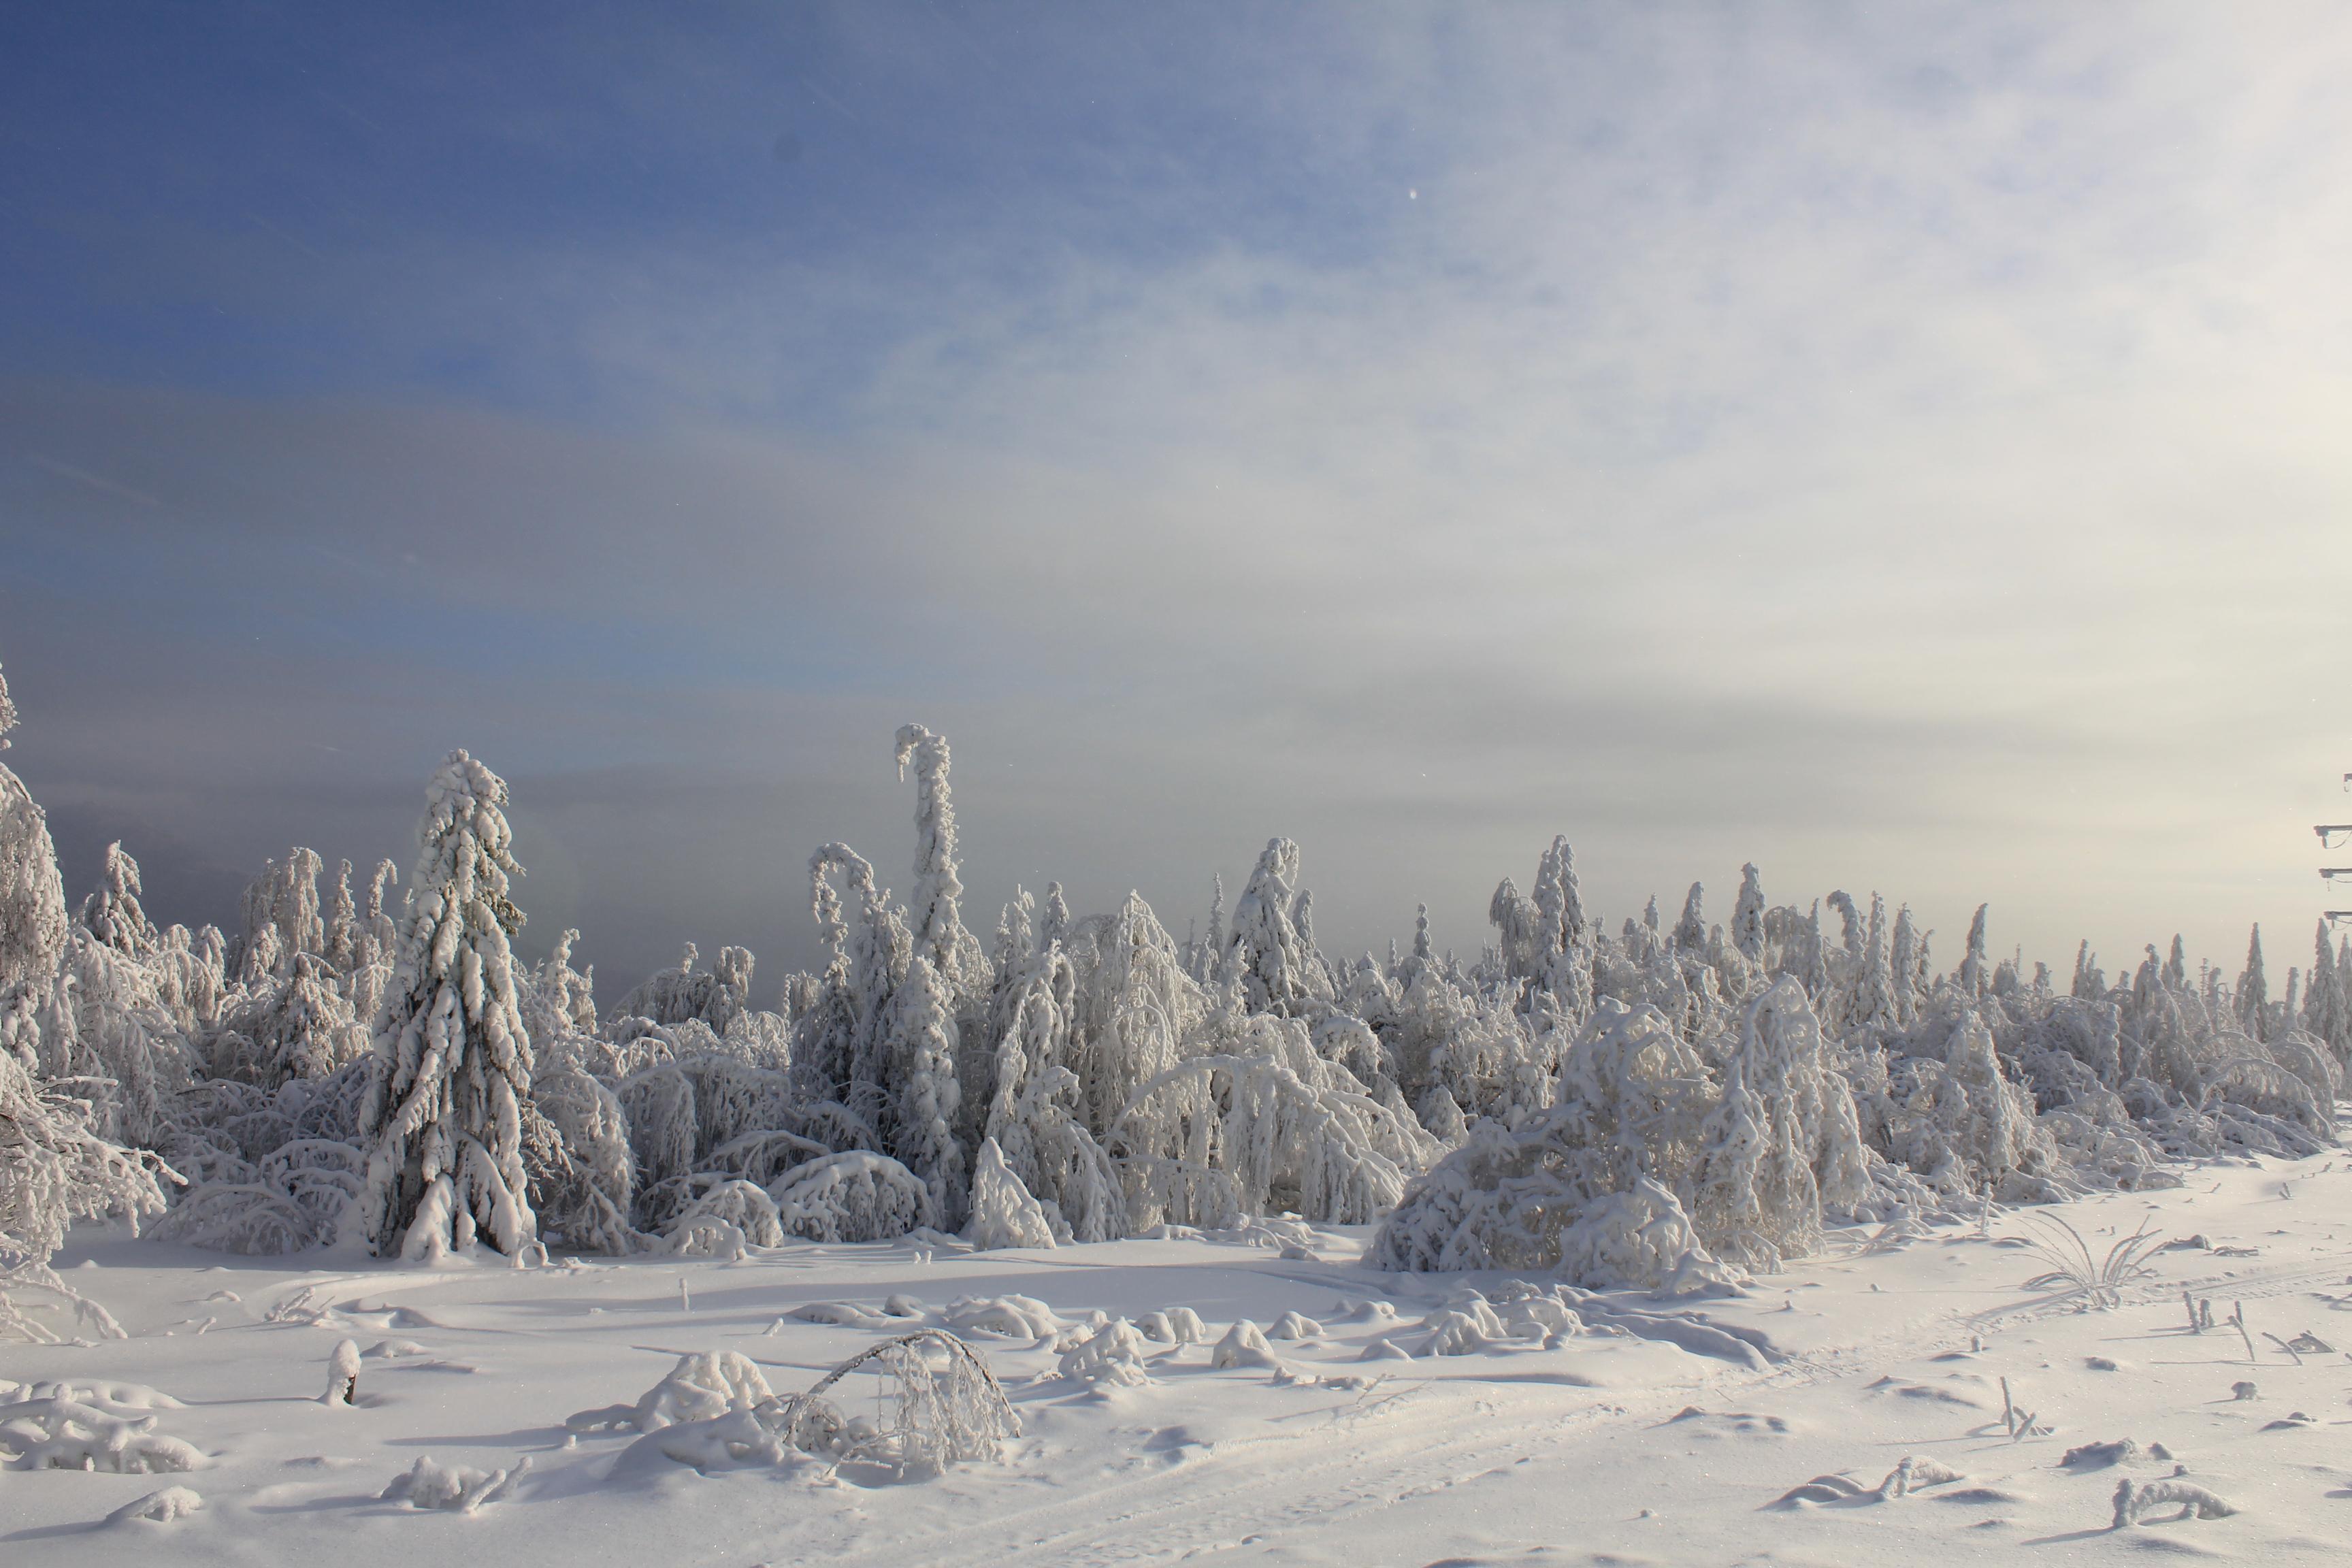 winter fantasmogoriya by Hudojnica